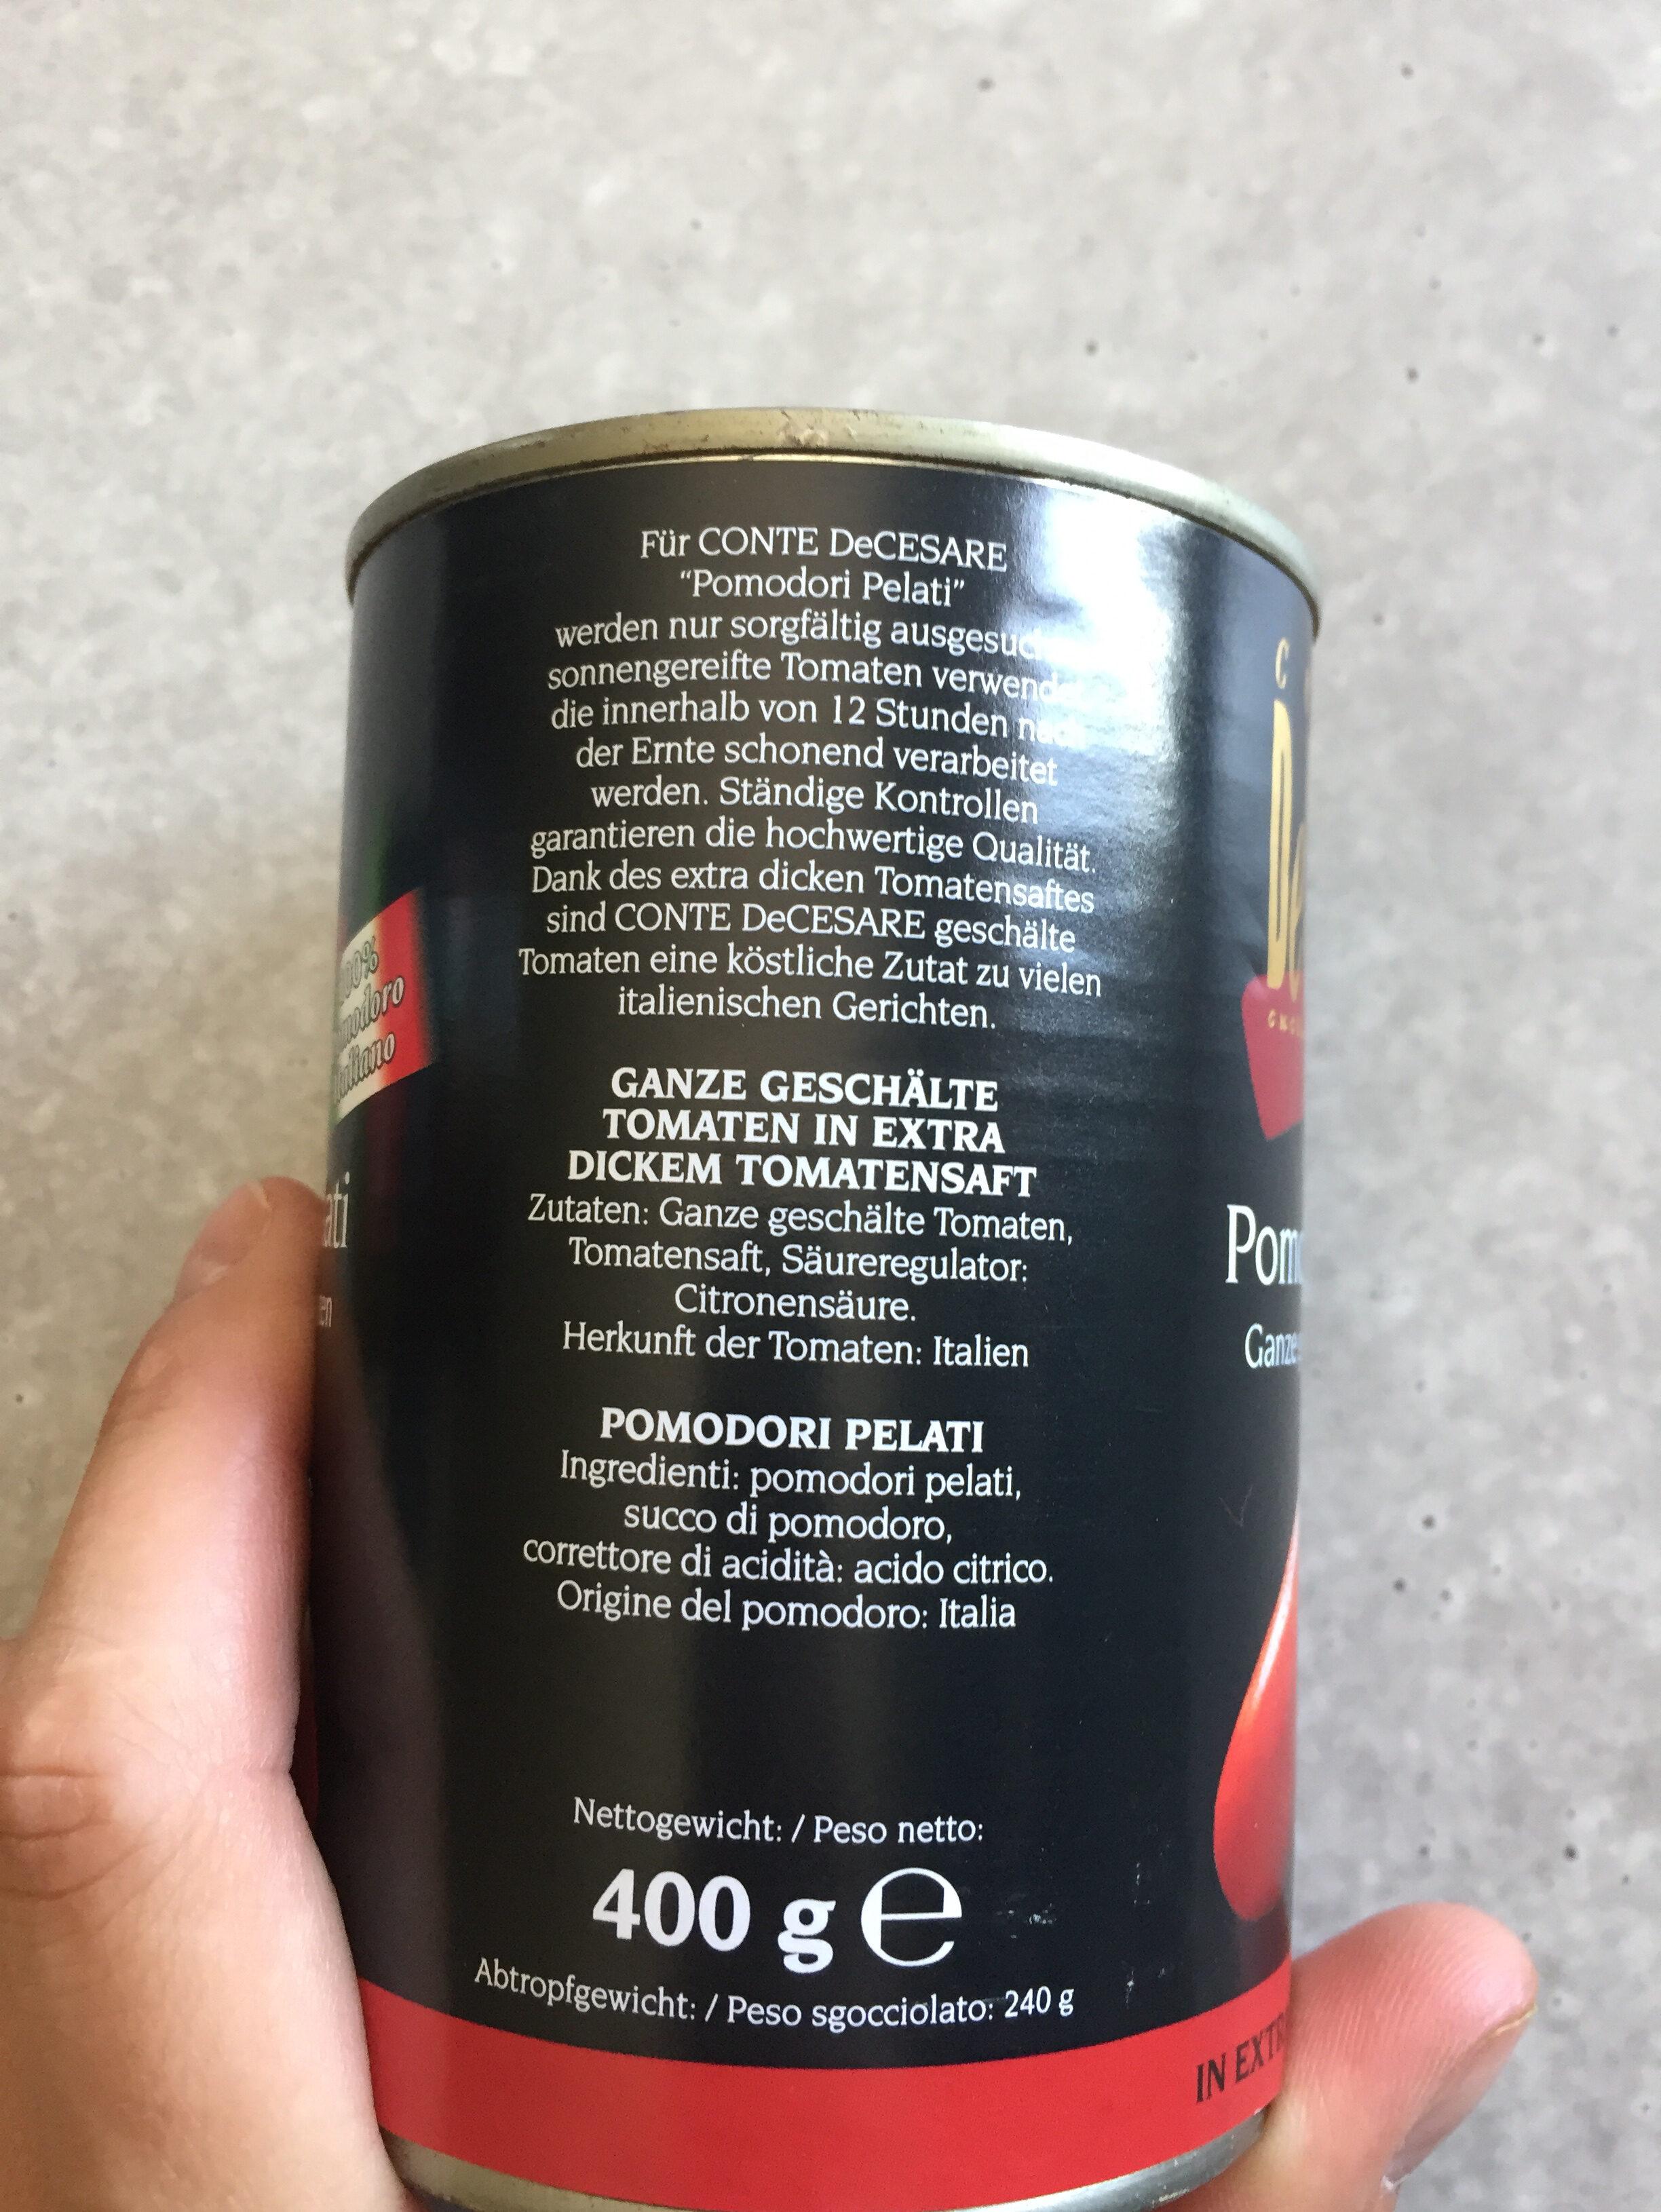 Ganze geschälte Tomaten - Ingrédients - de